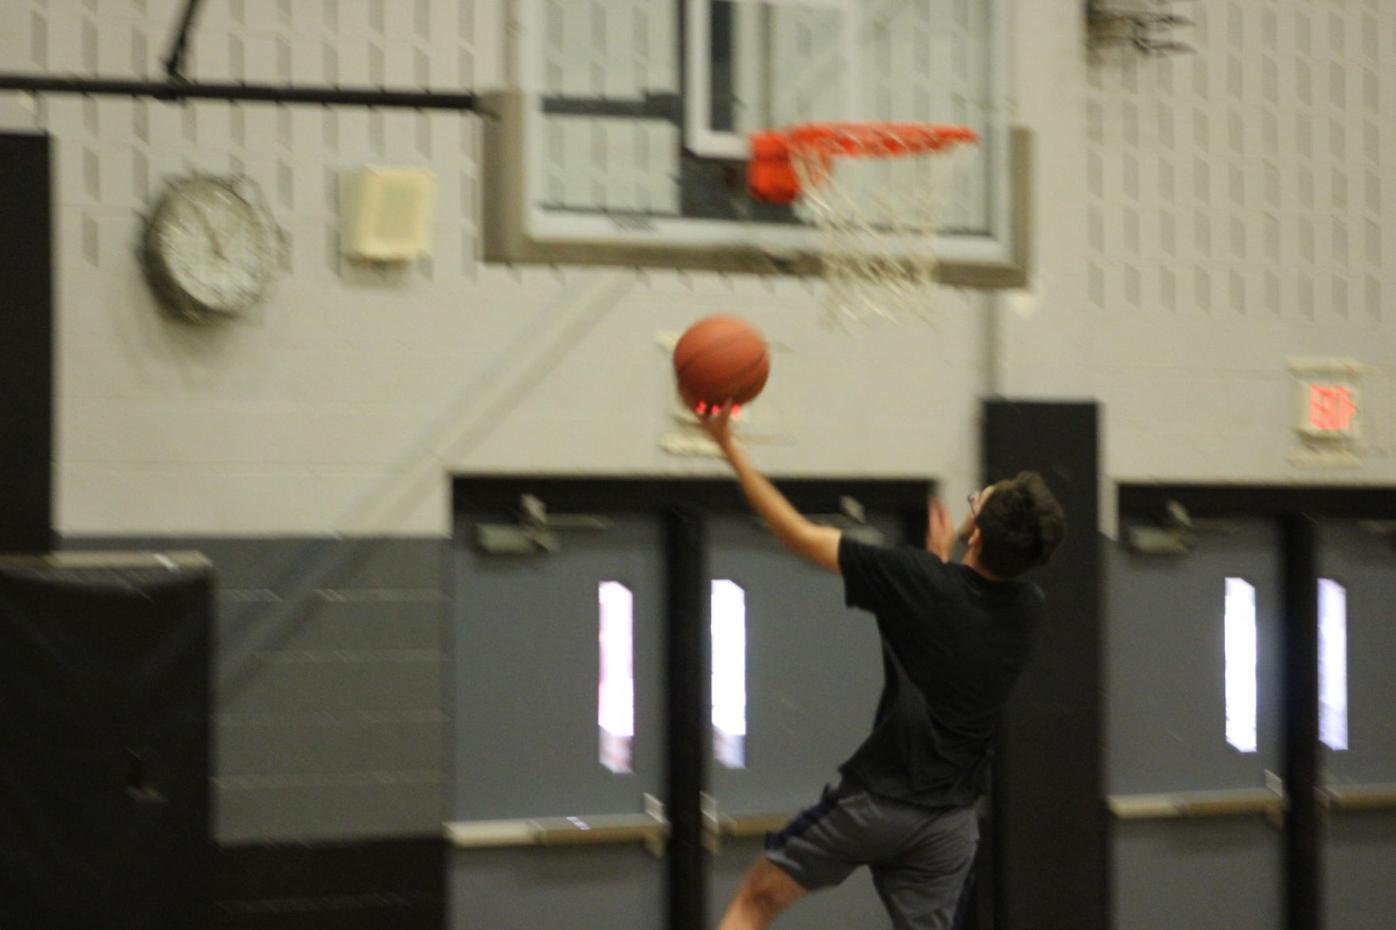 PHS Basketball Practice layup